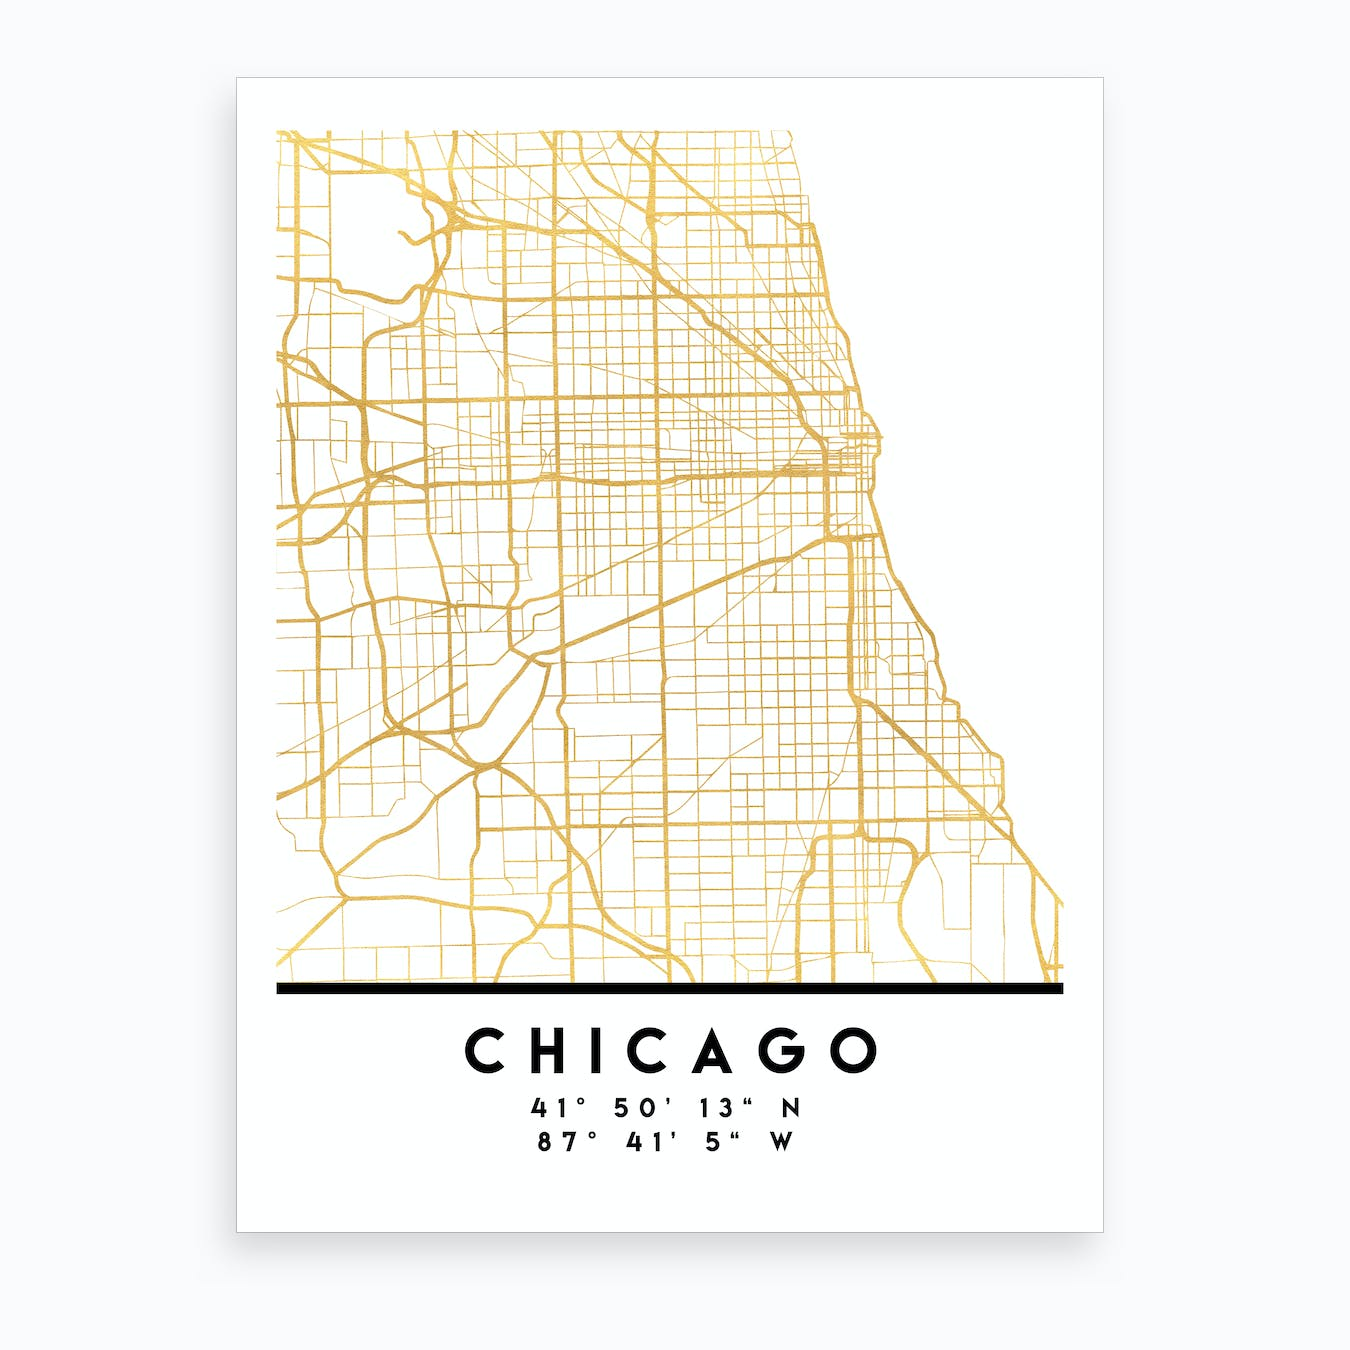 Chicago Illinois City Street Map